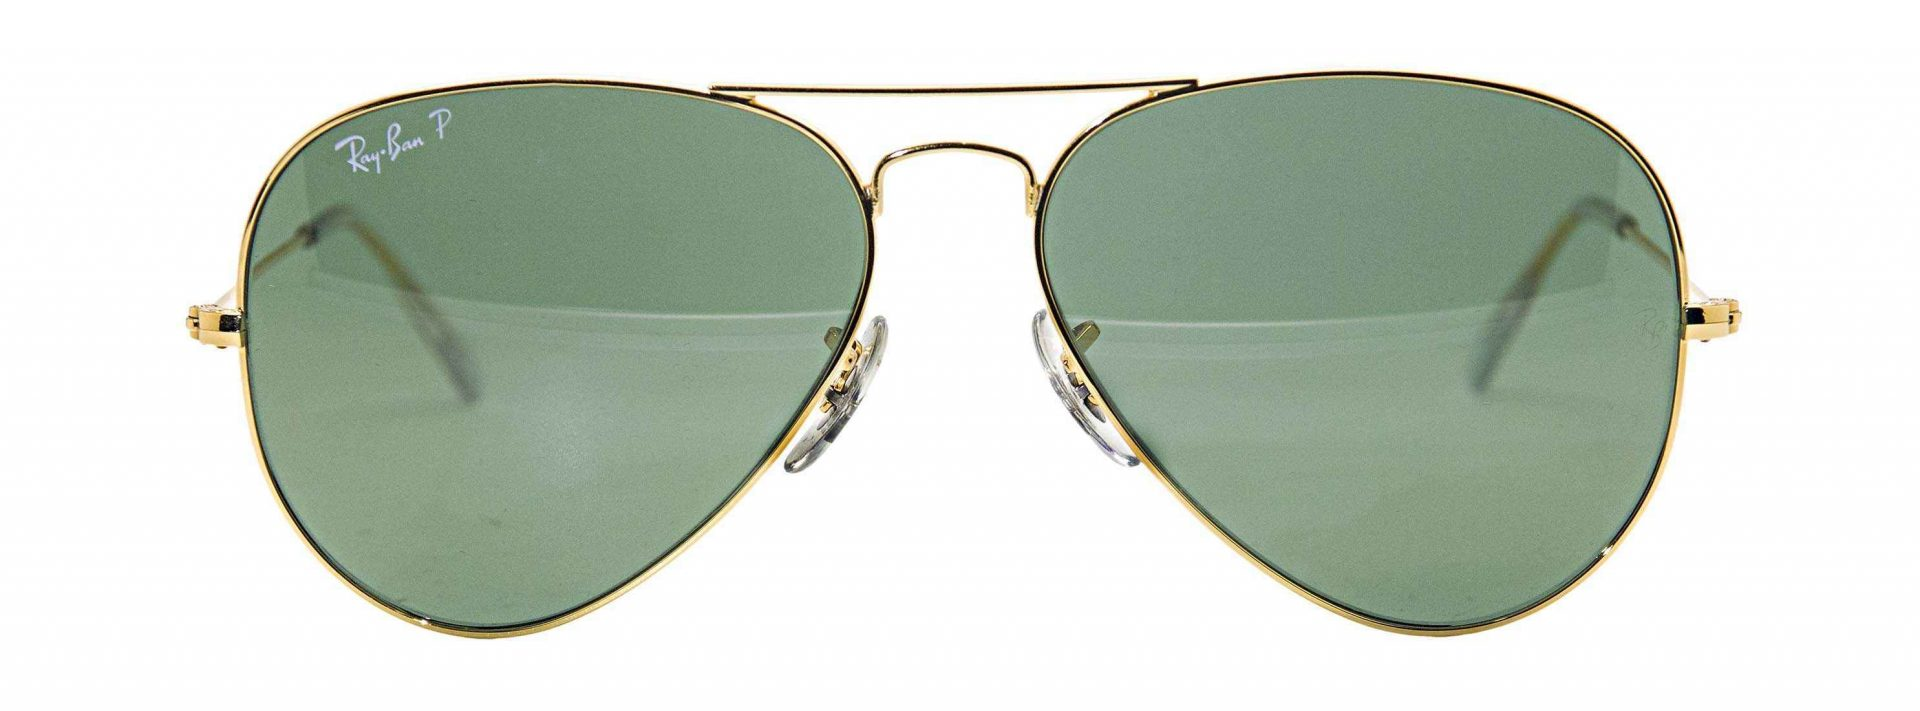 Ray-Ban Sunglasses 3025 01 2970x1100